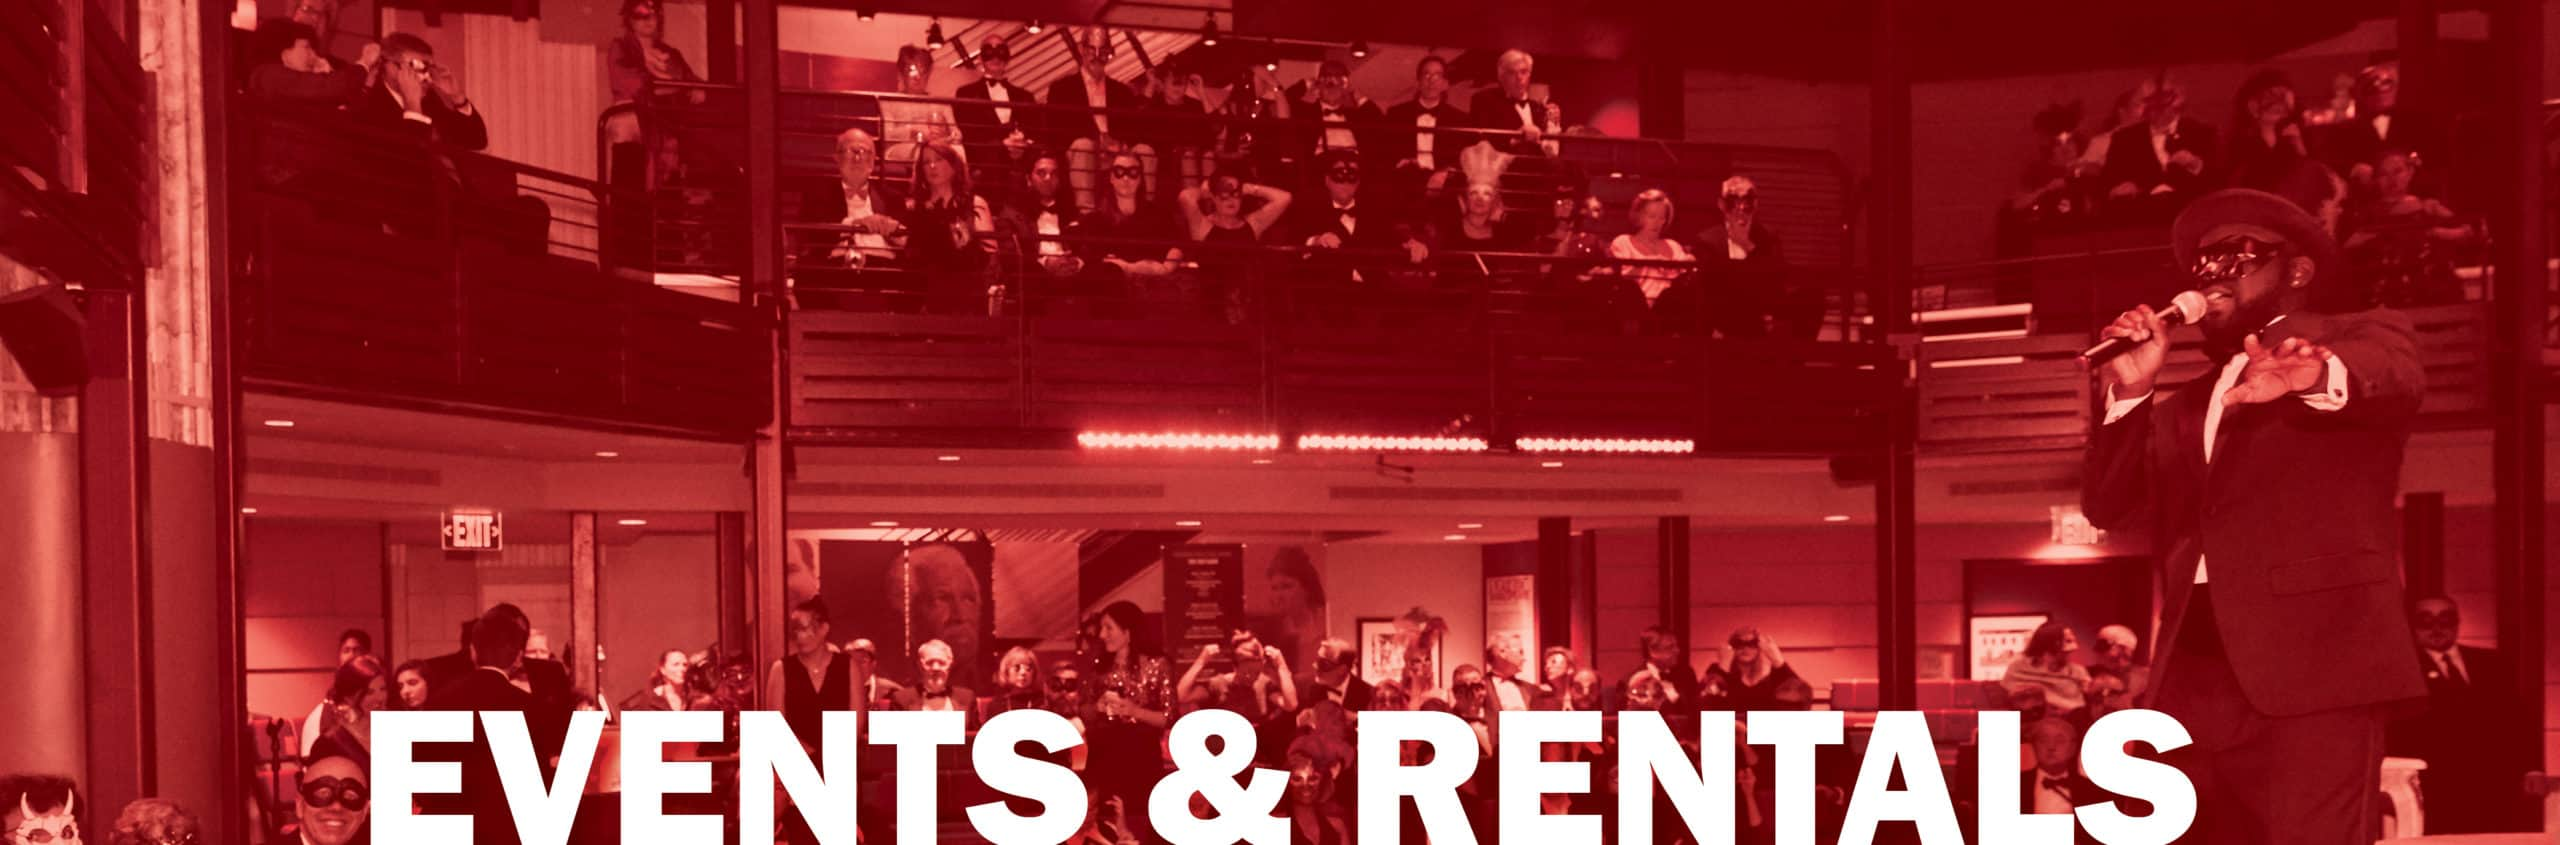 Events and Rentals